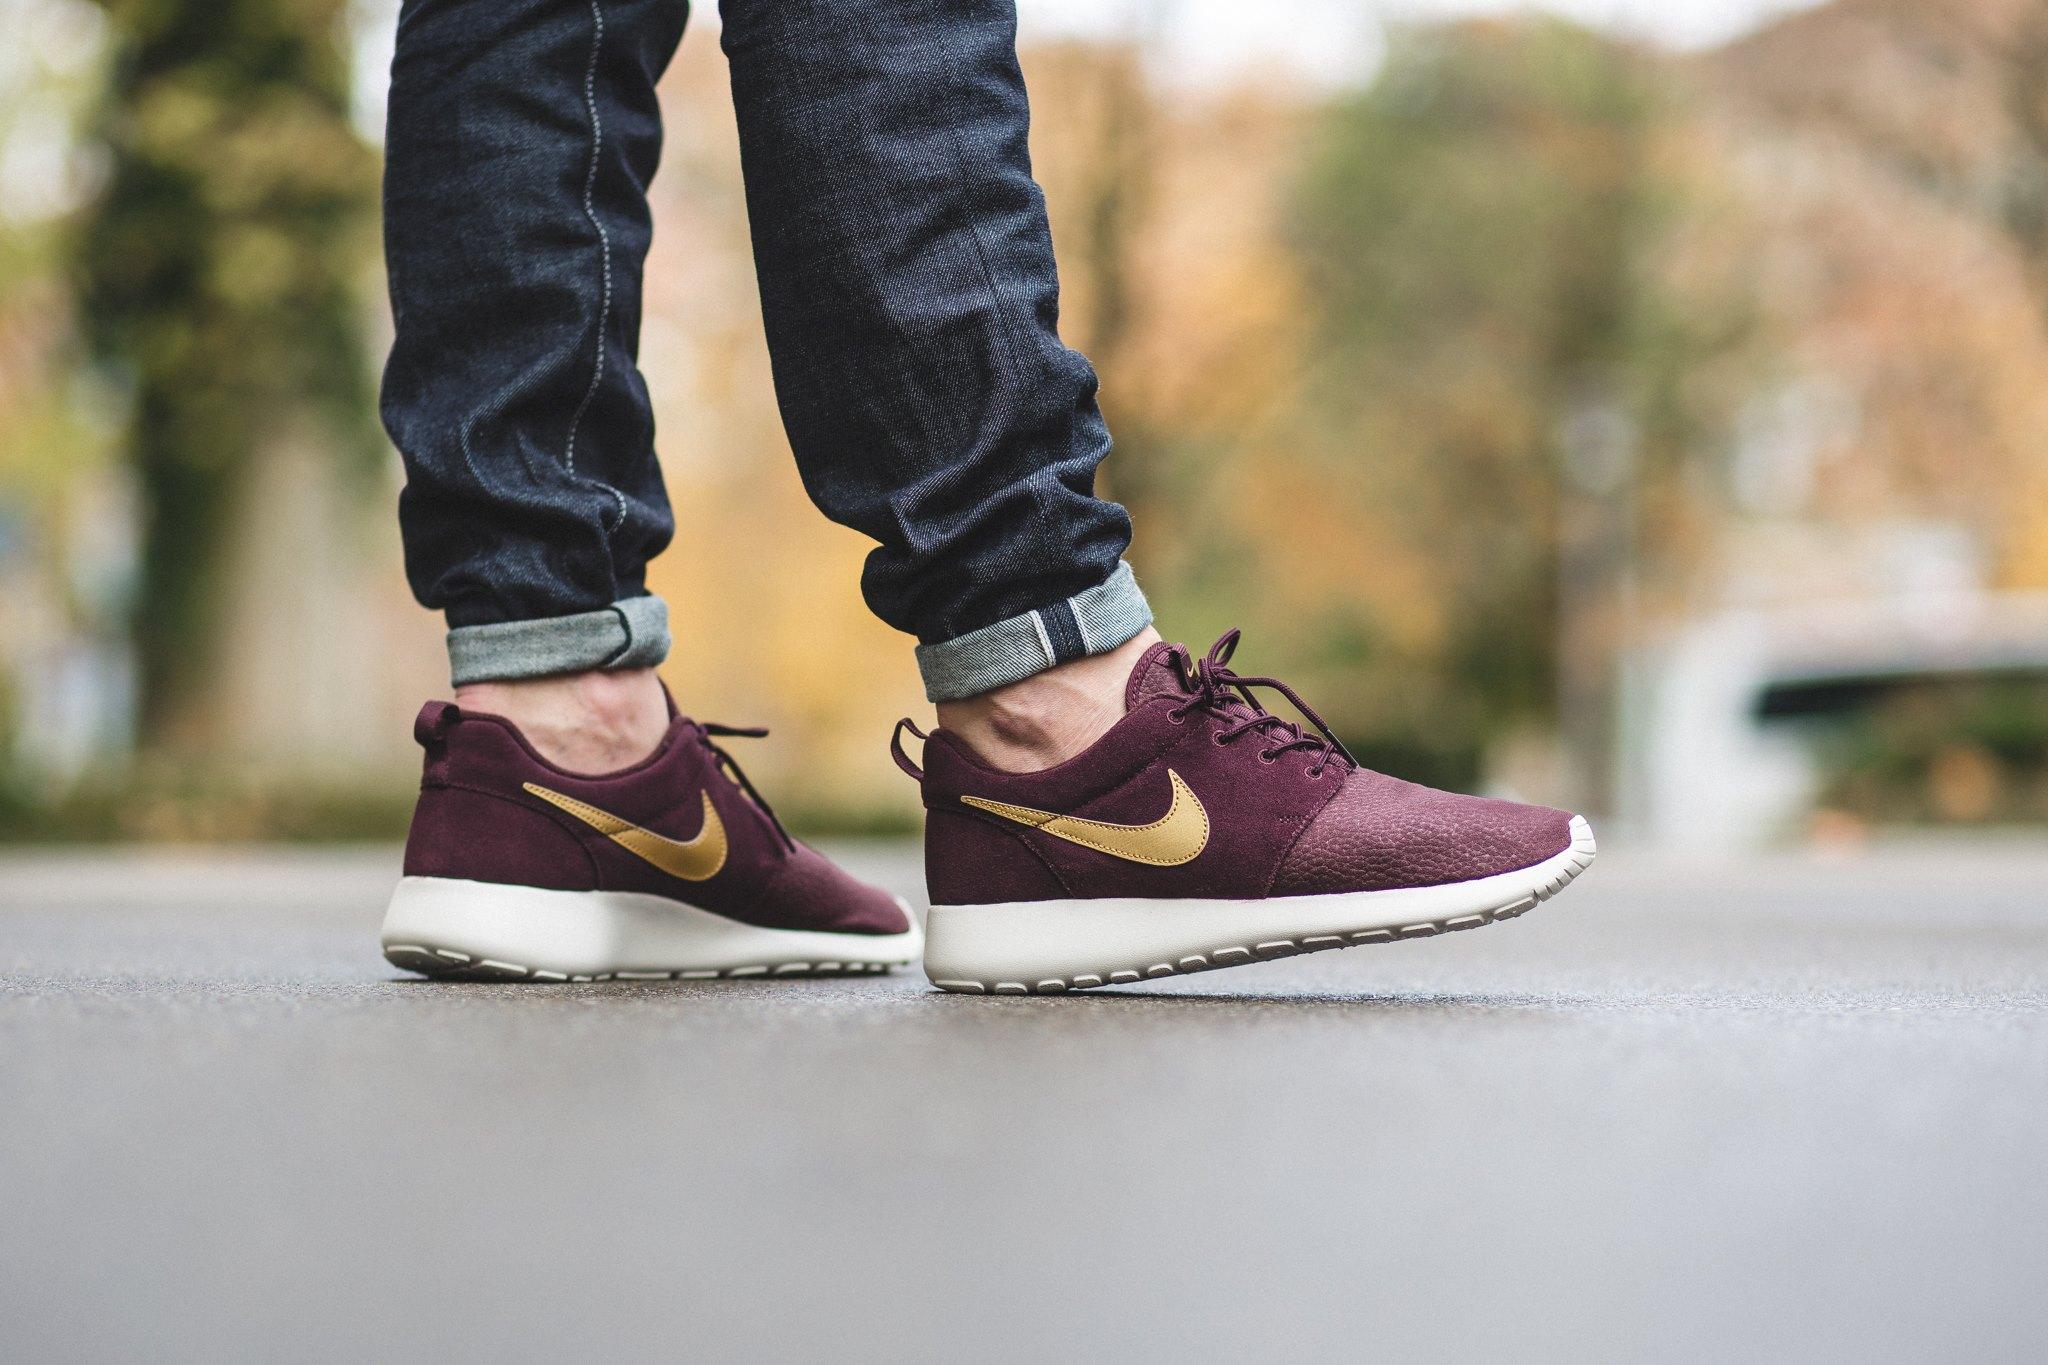 Homme Modèlesles Nike Roshe Nombreux Cher Pas Run Chaussures IxZdpq